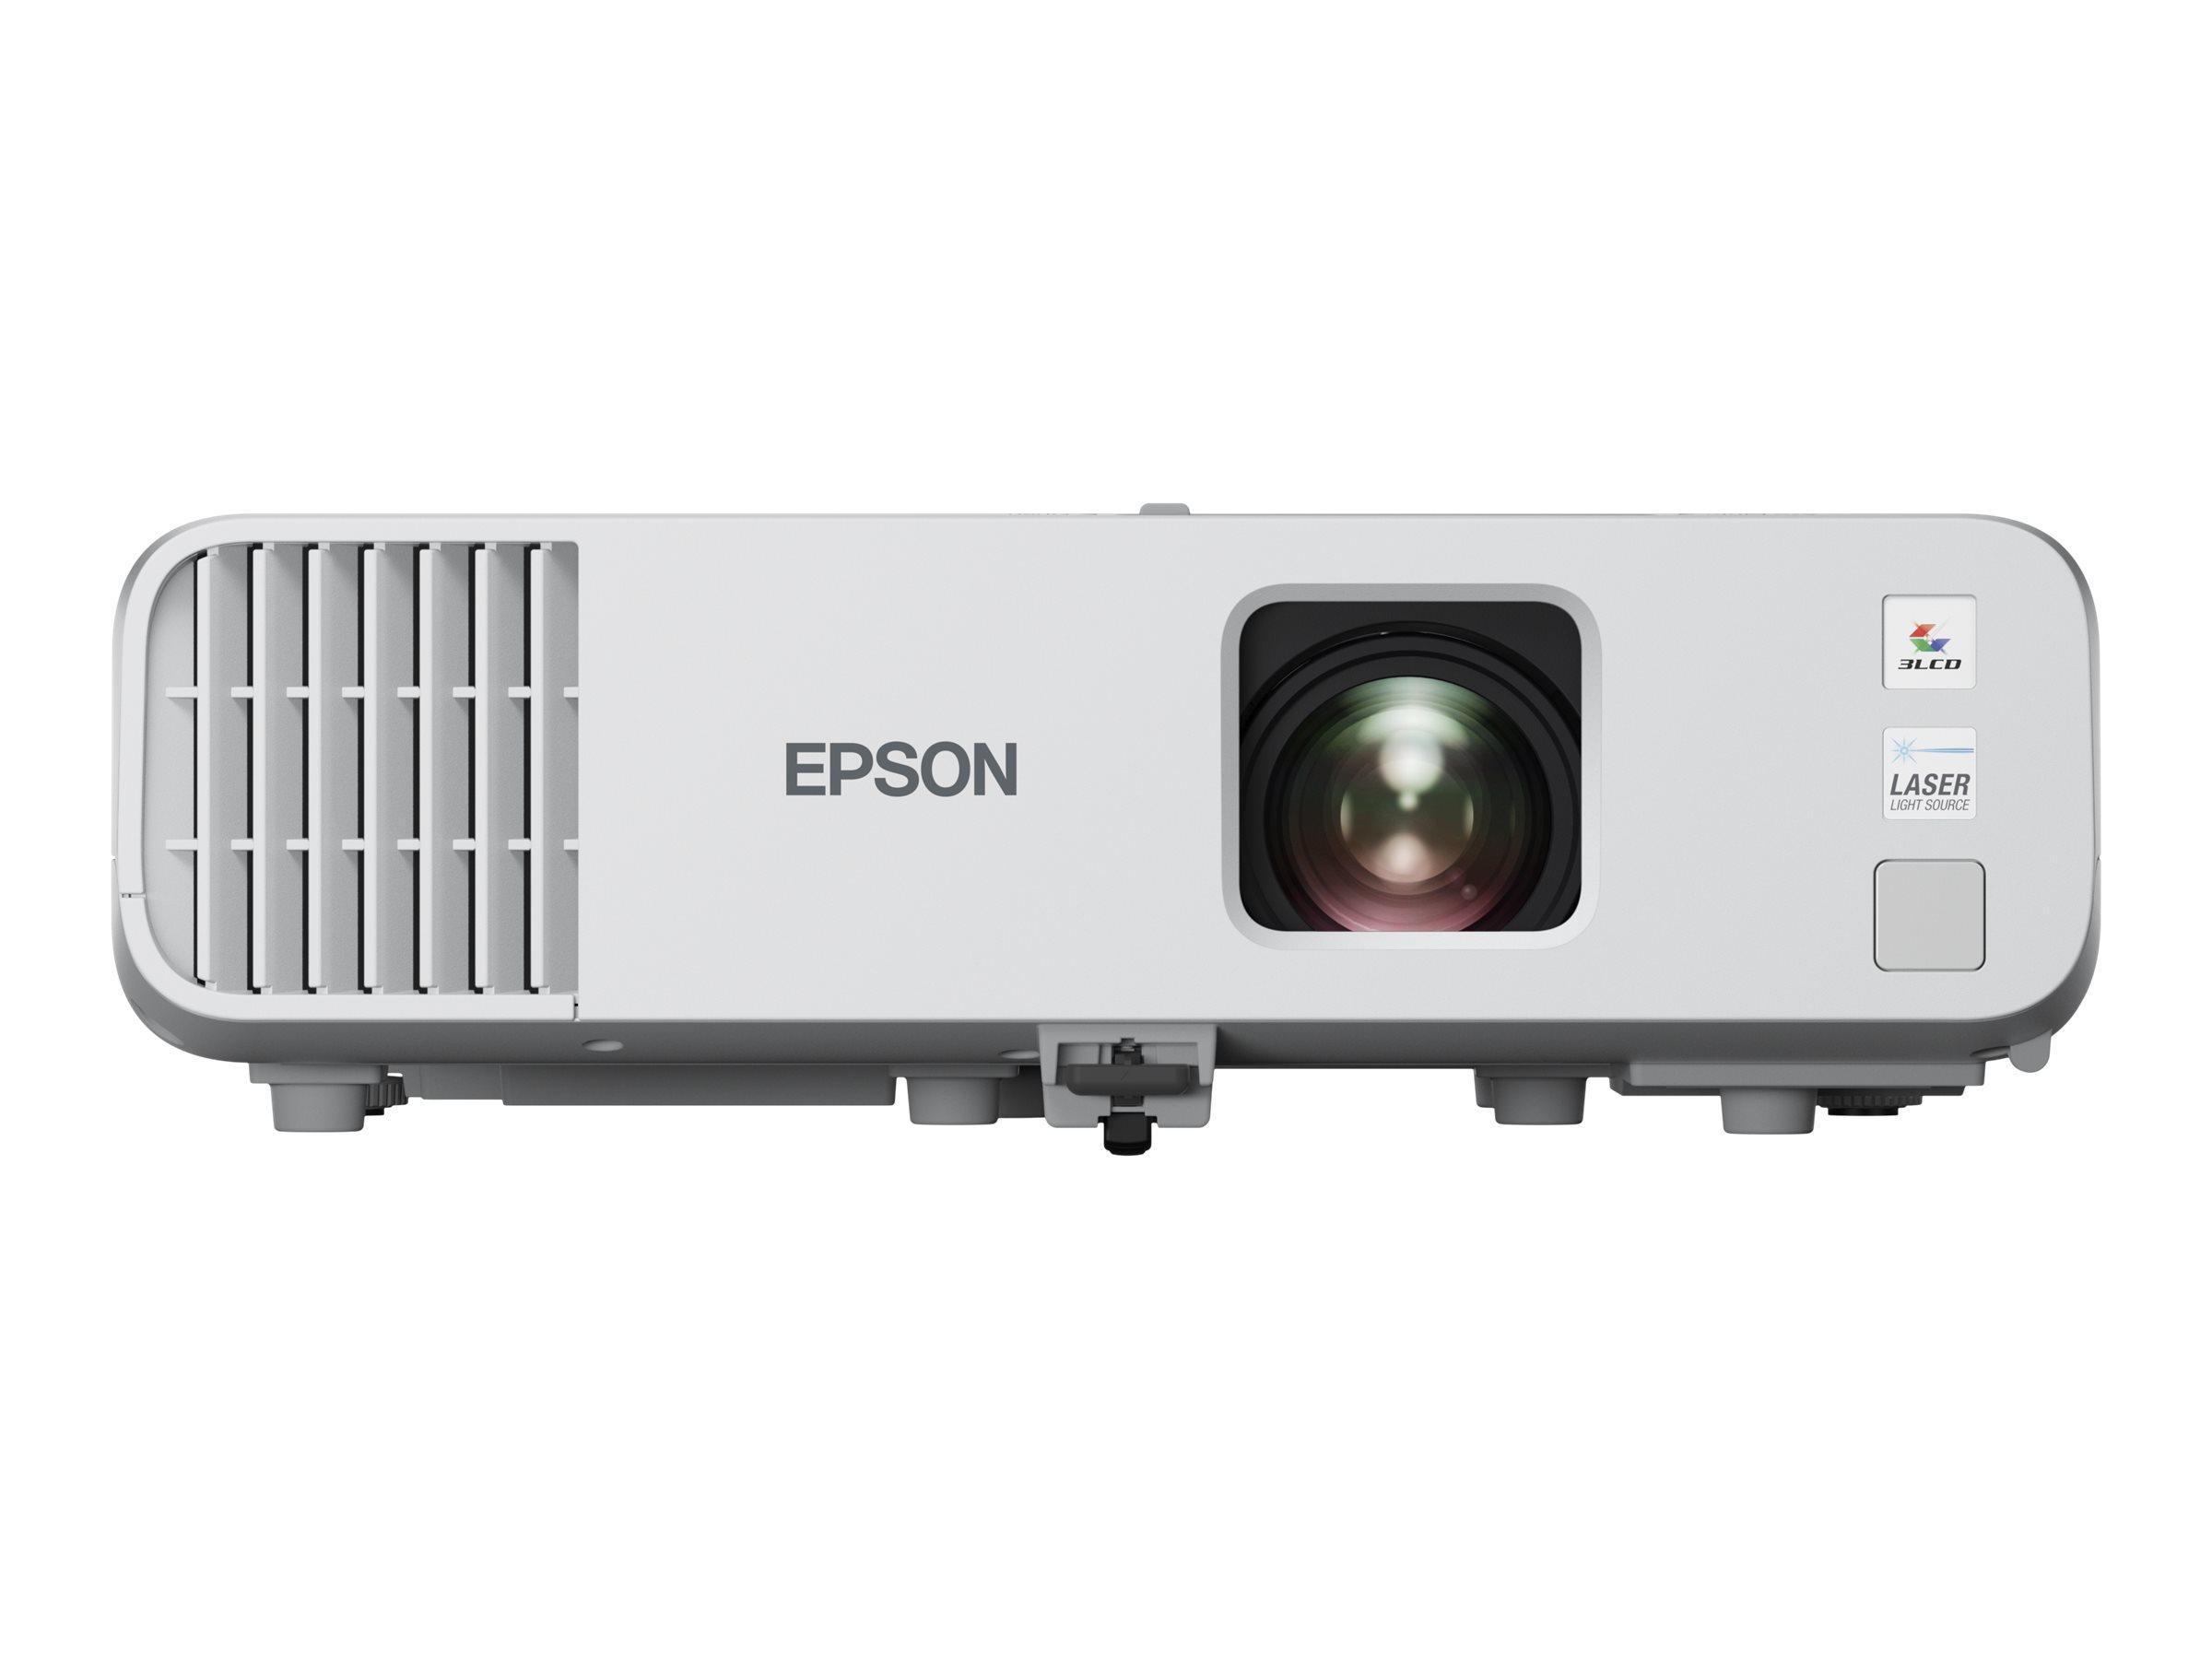 Epson PowerLite L200W - 3LCD projector - 802.11a/b/g/n wireless / LAN / Miracast Wi-Fi Display